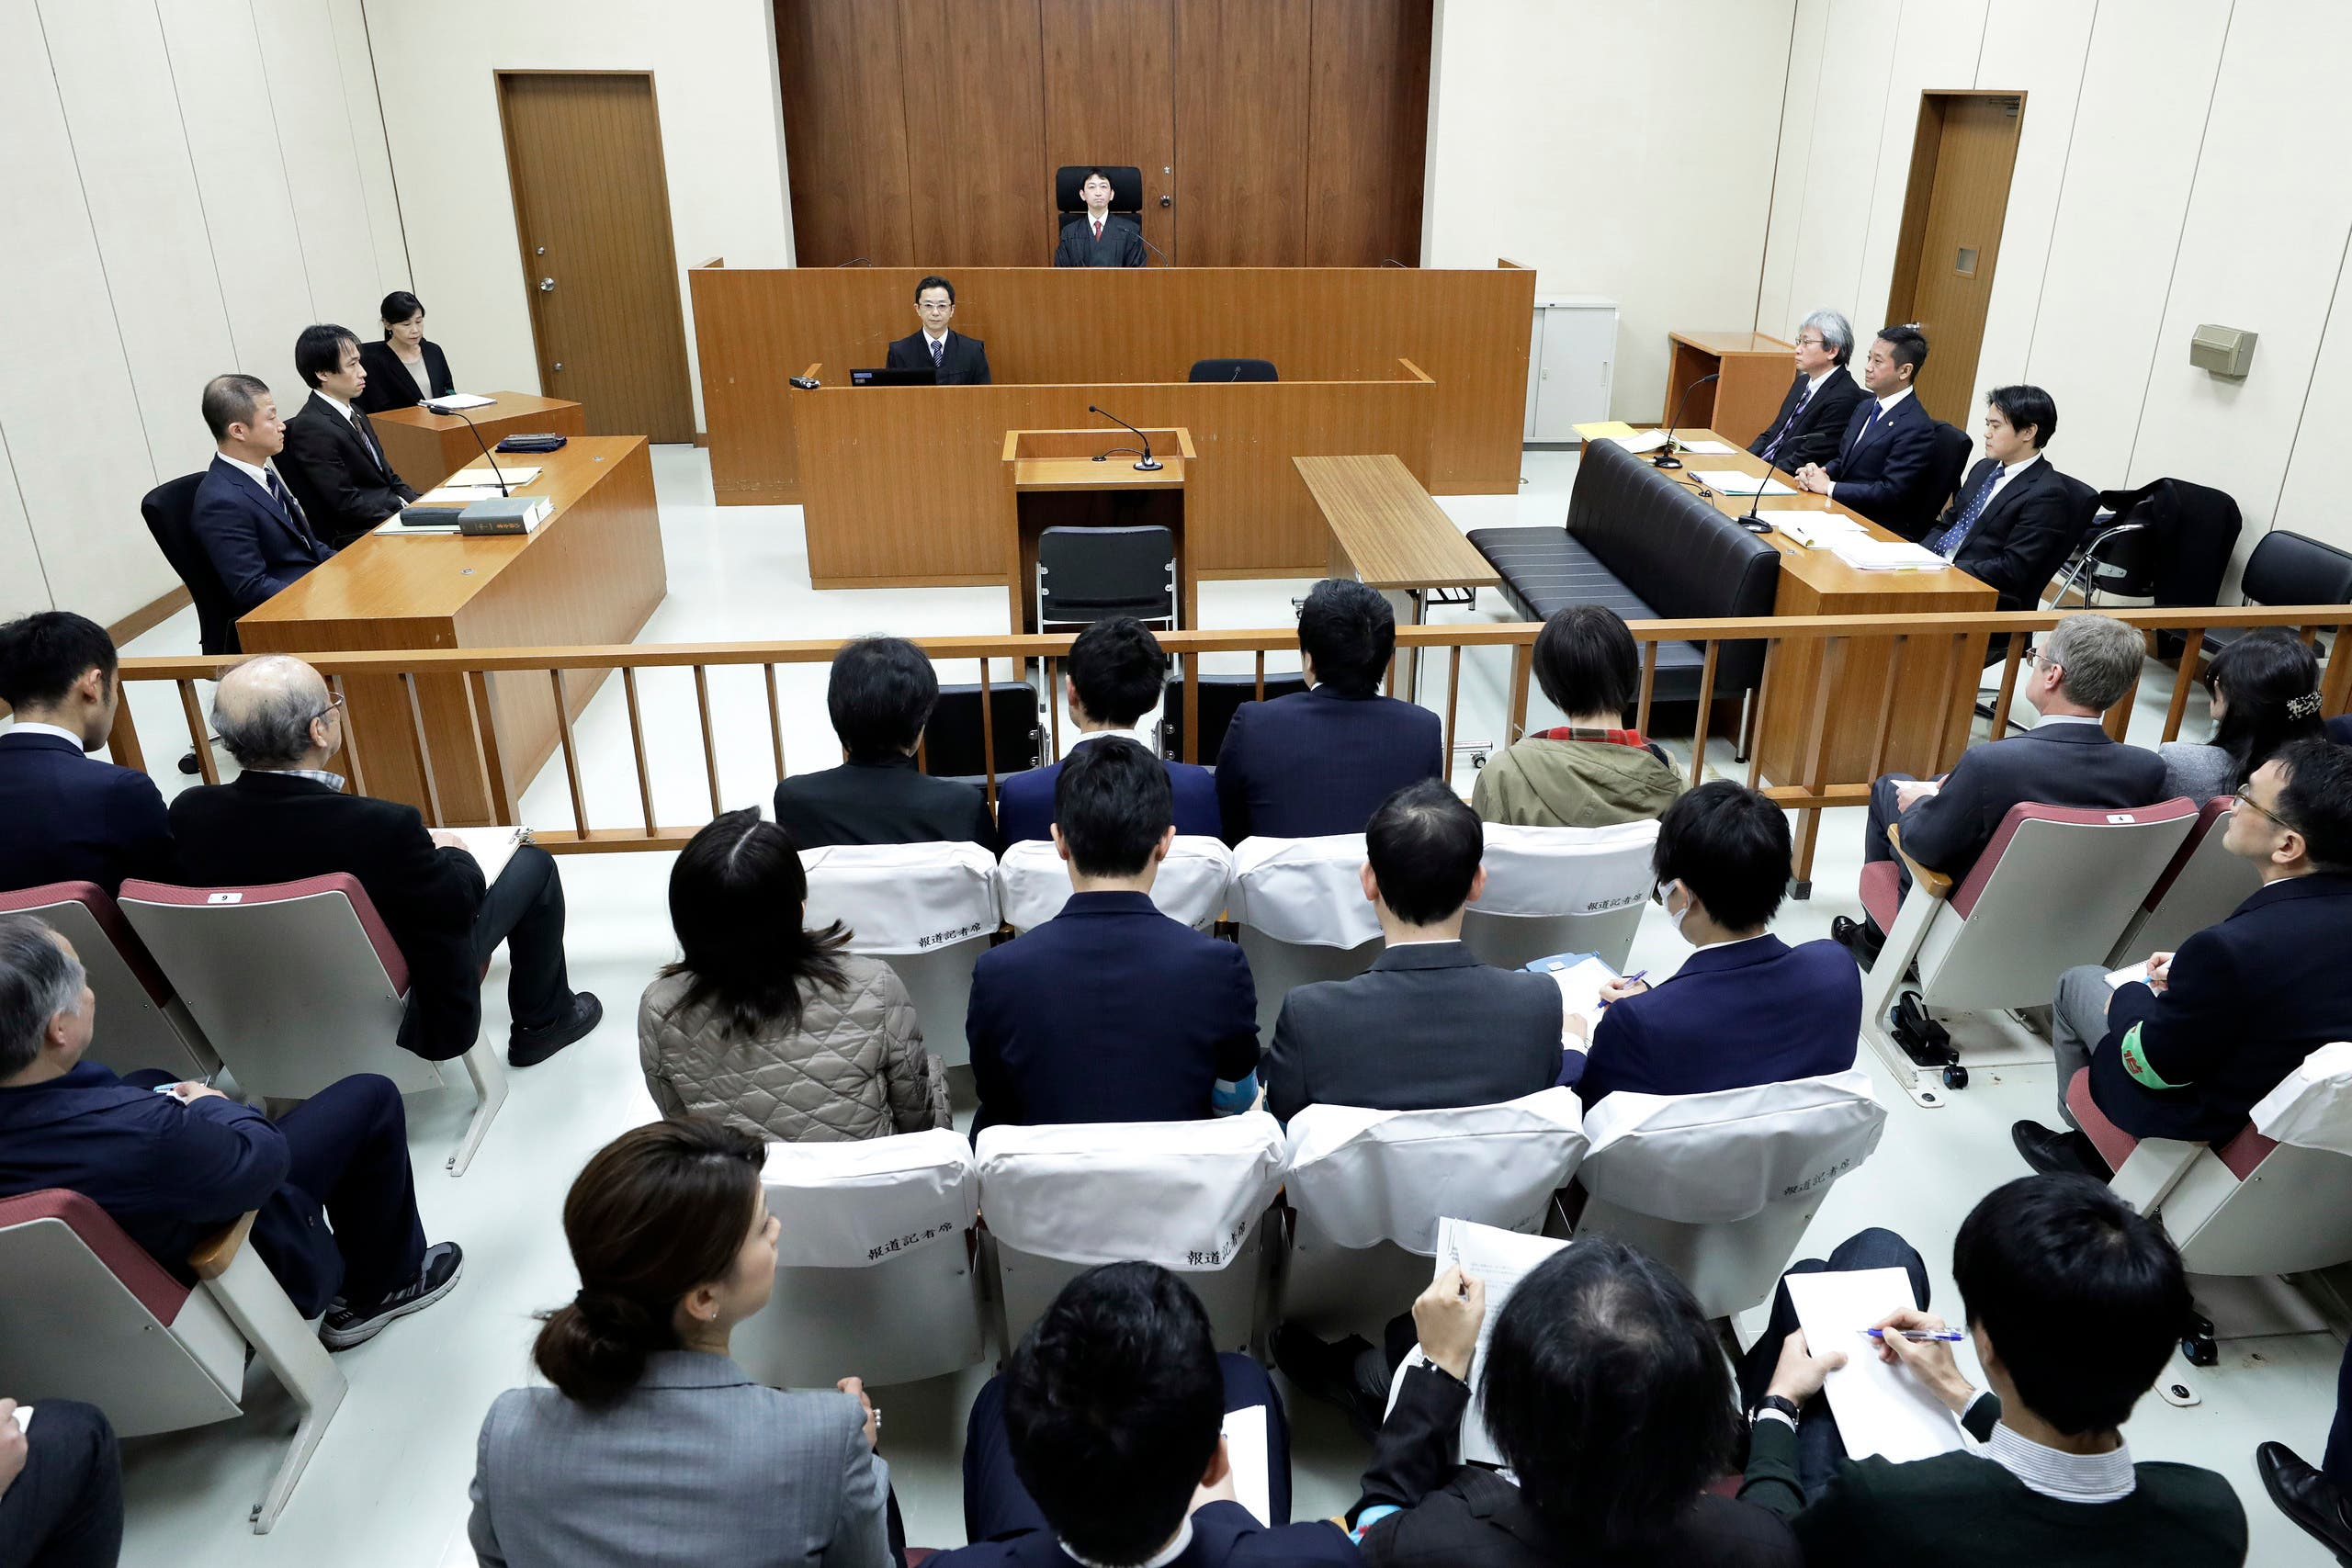 محكمة طوكيو حيث كان كارلوس غصن يحاكم